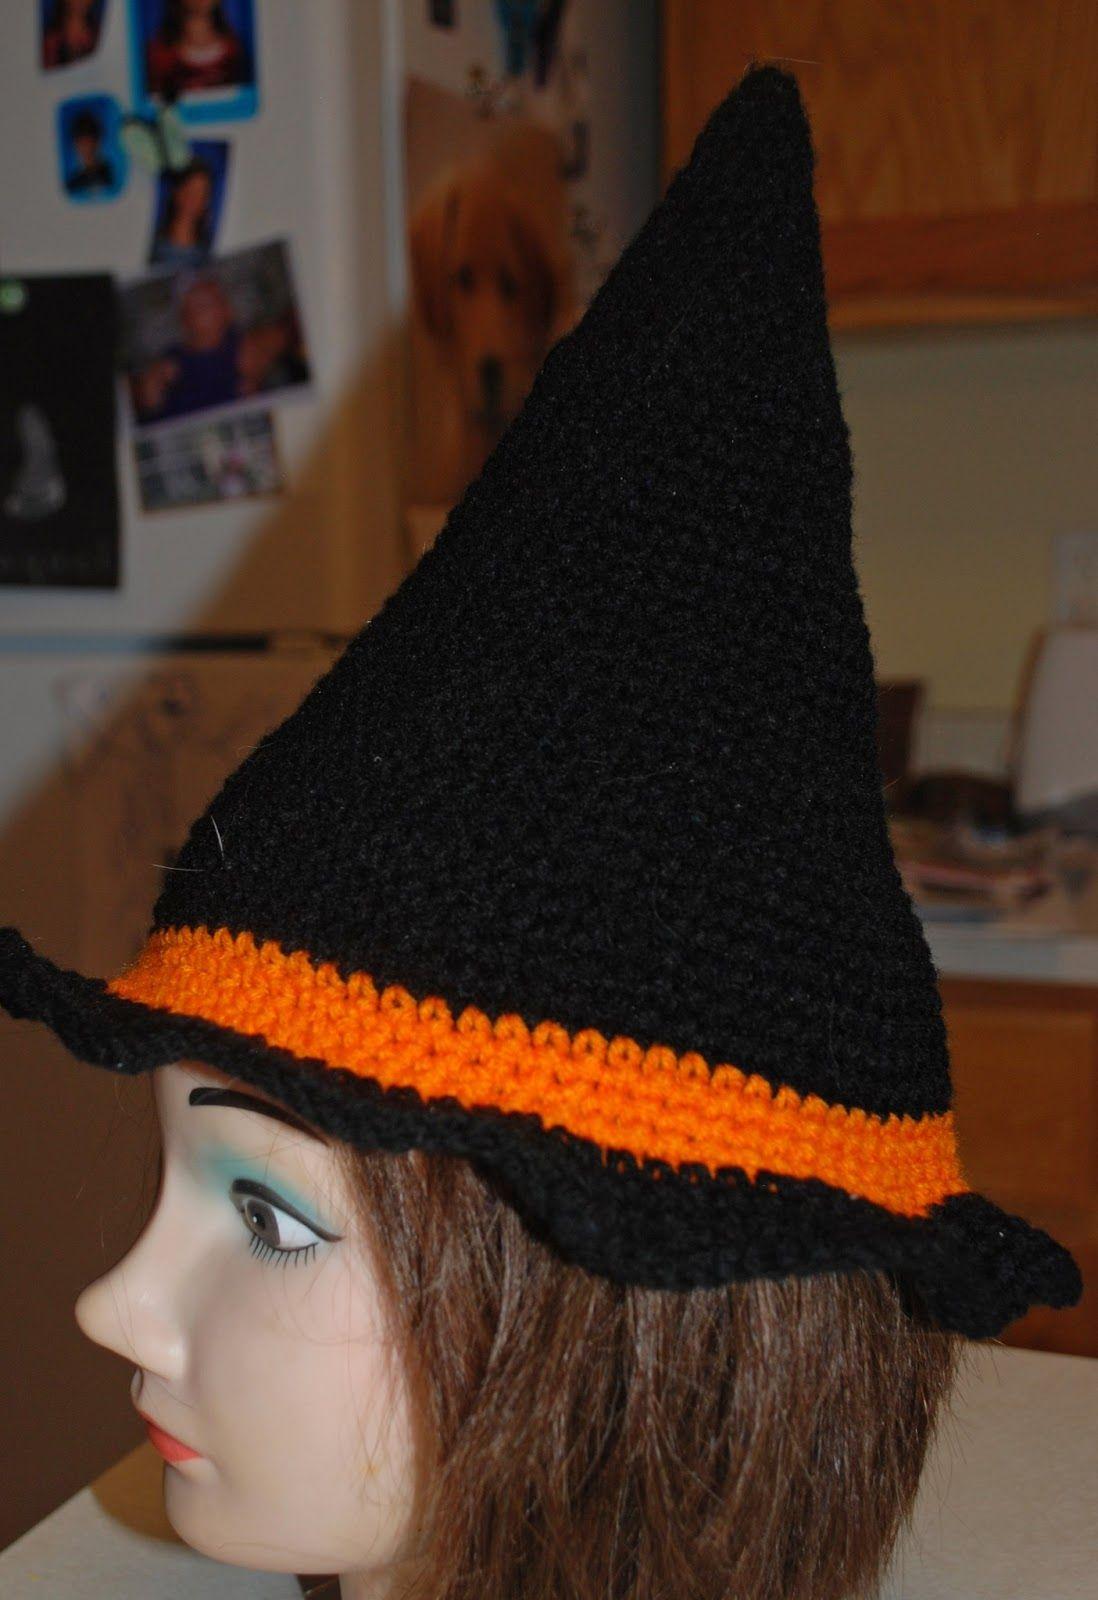 Free crochet pattern - Crochet Creative Creations: Crochet Witch Hat ...